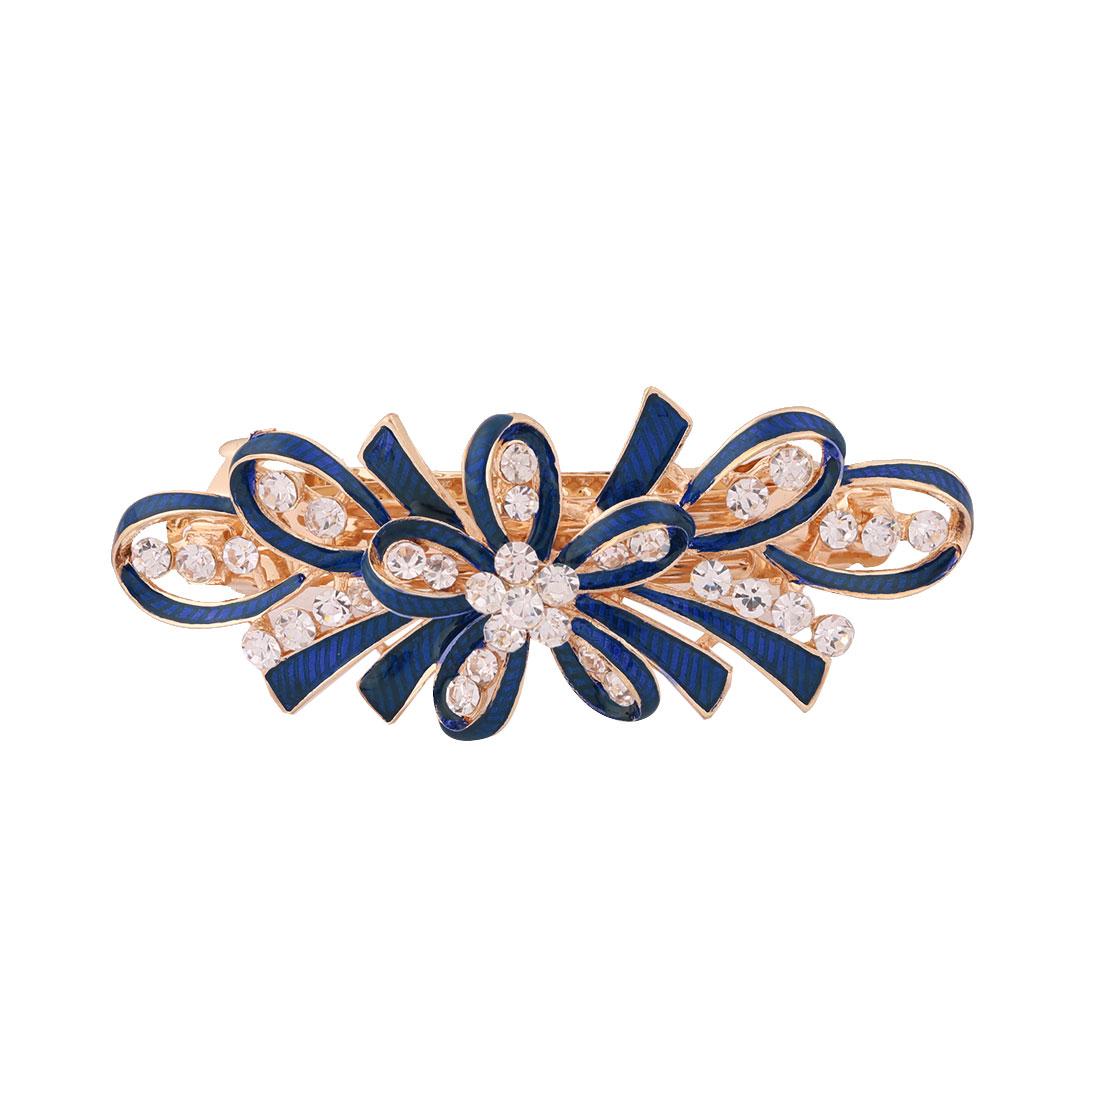 Lady Metal Bowknot Design Faux Rhinestones Inlaid Hairwearing Hair Clip Blue